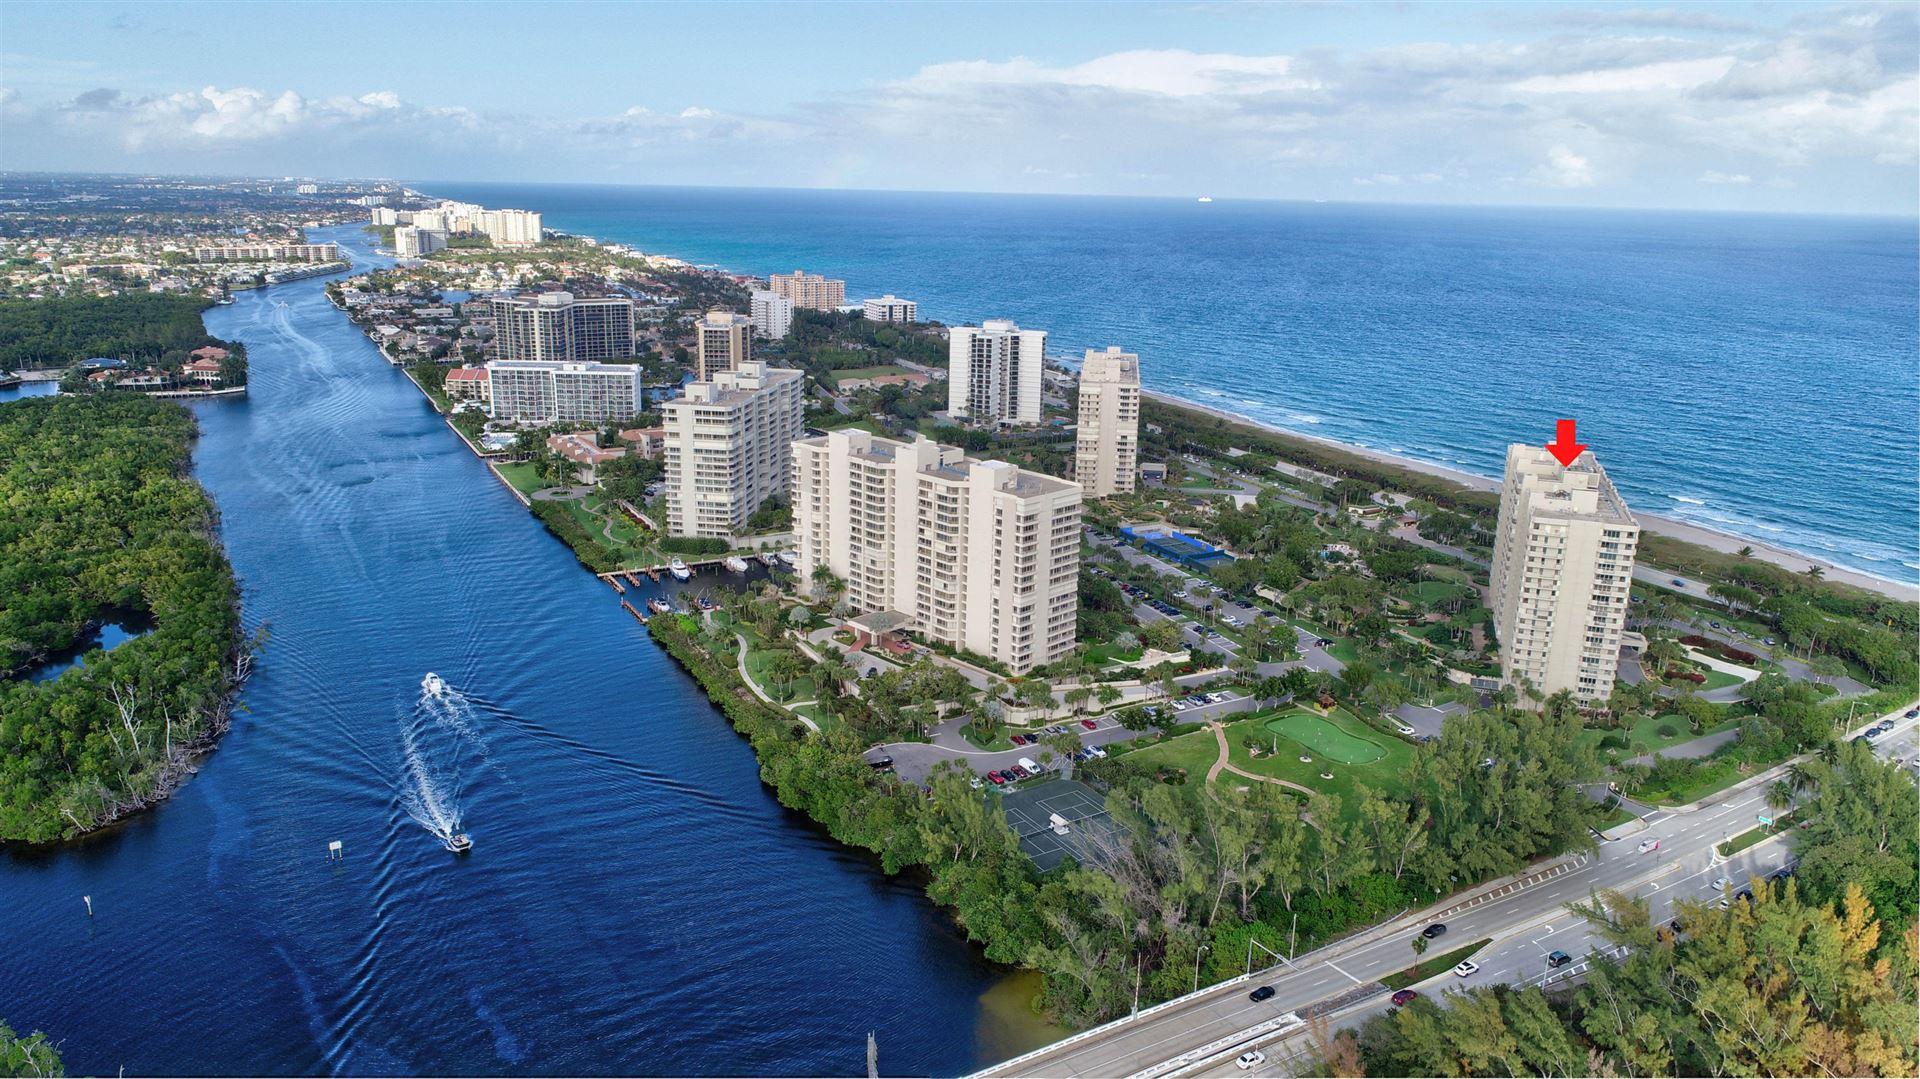 4001 N Ocean Boulevard #906, Boca Raton, FL 33431 - #: RX-10629190